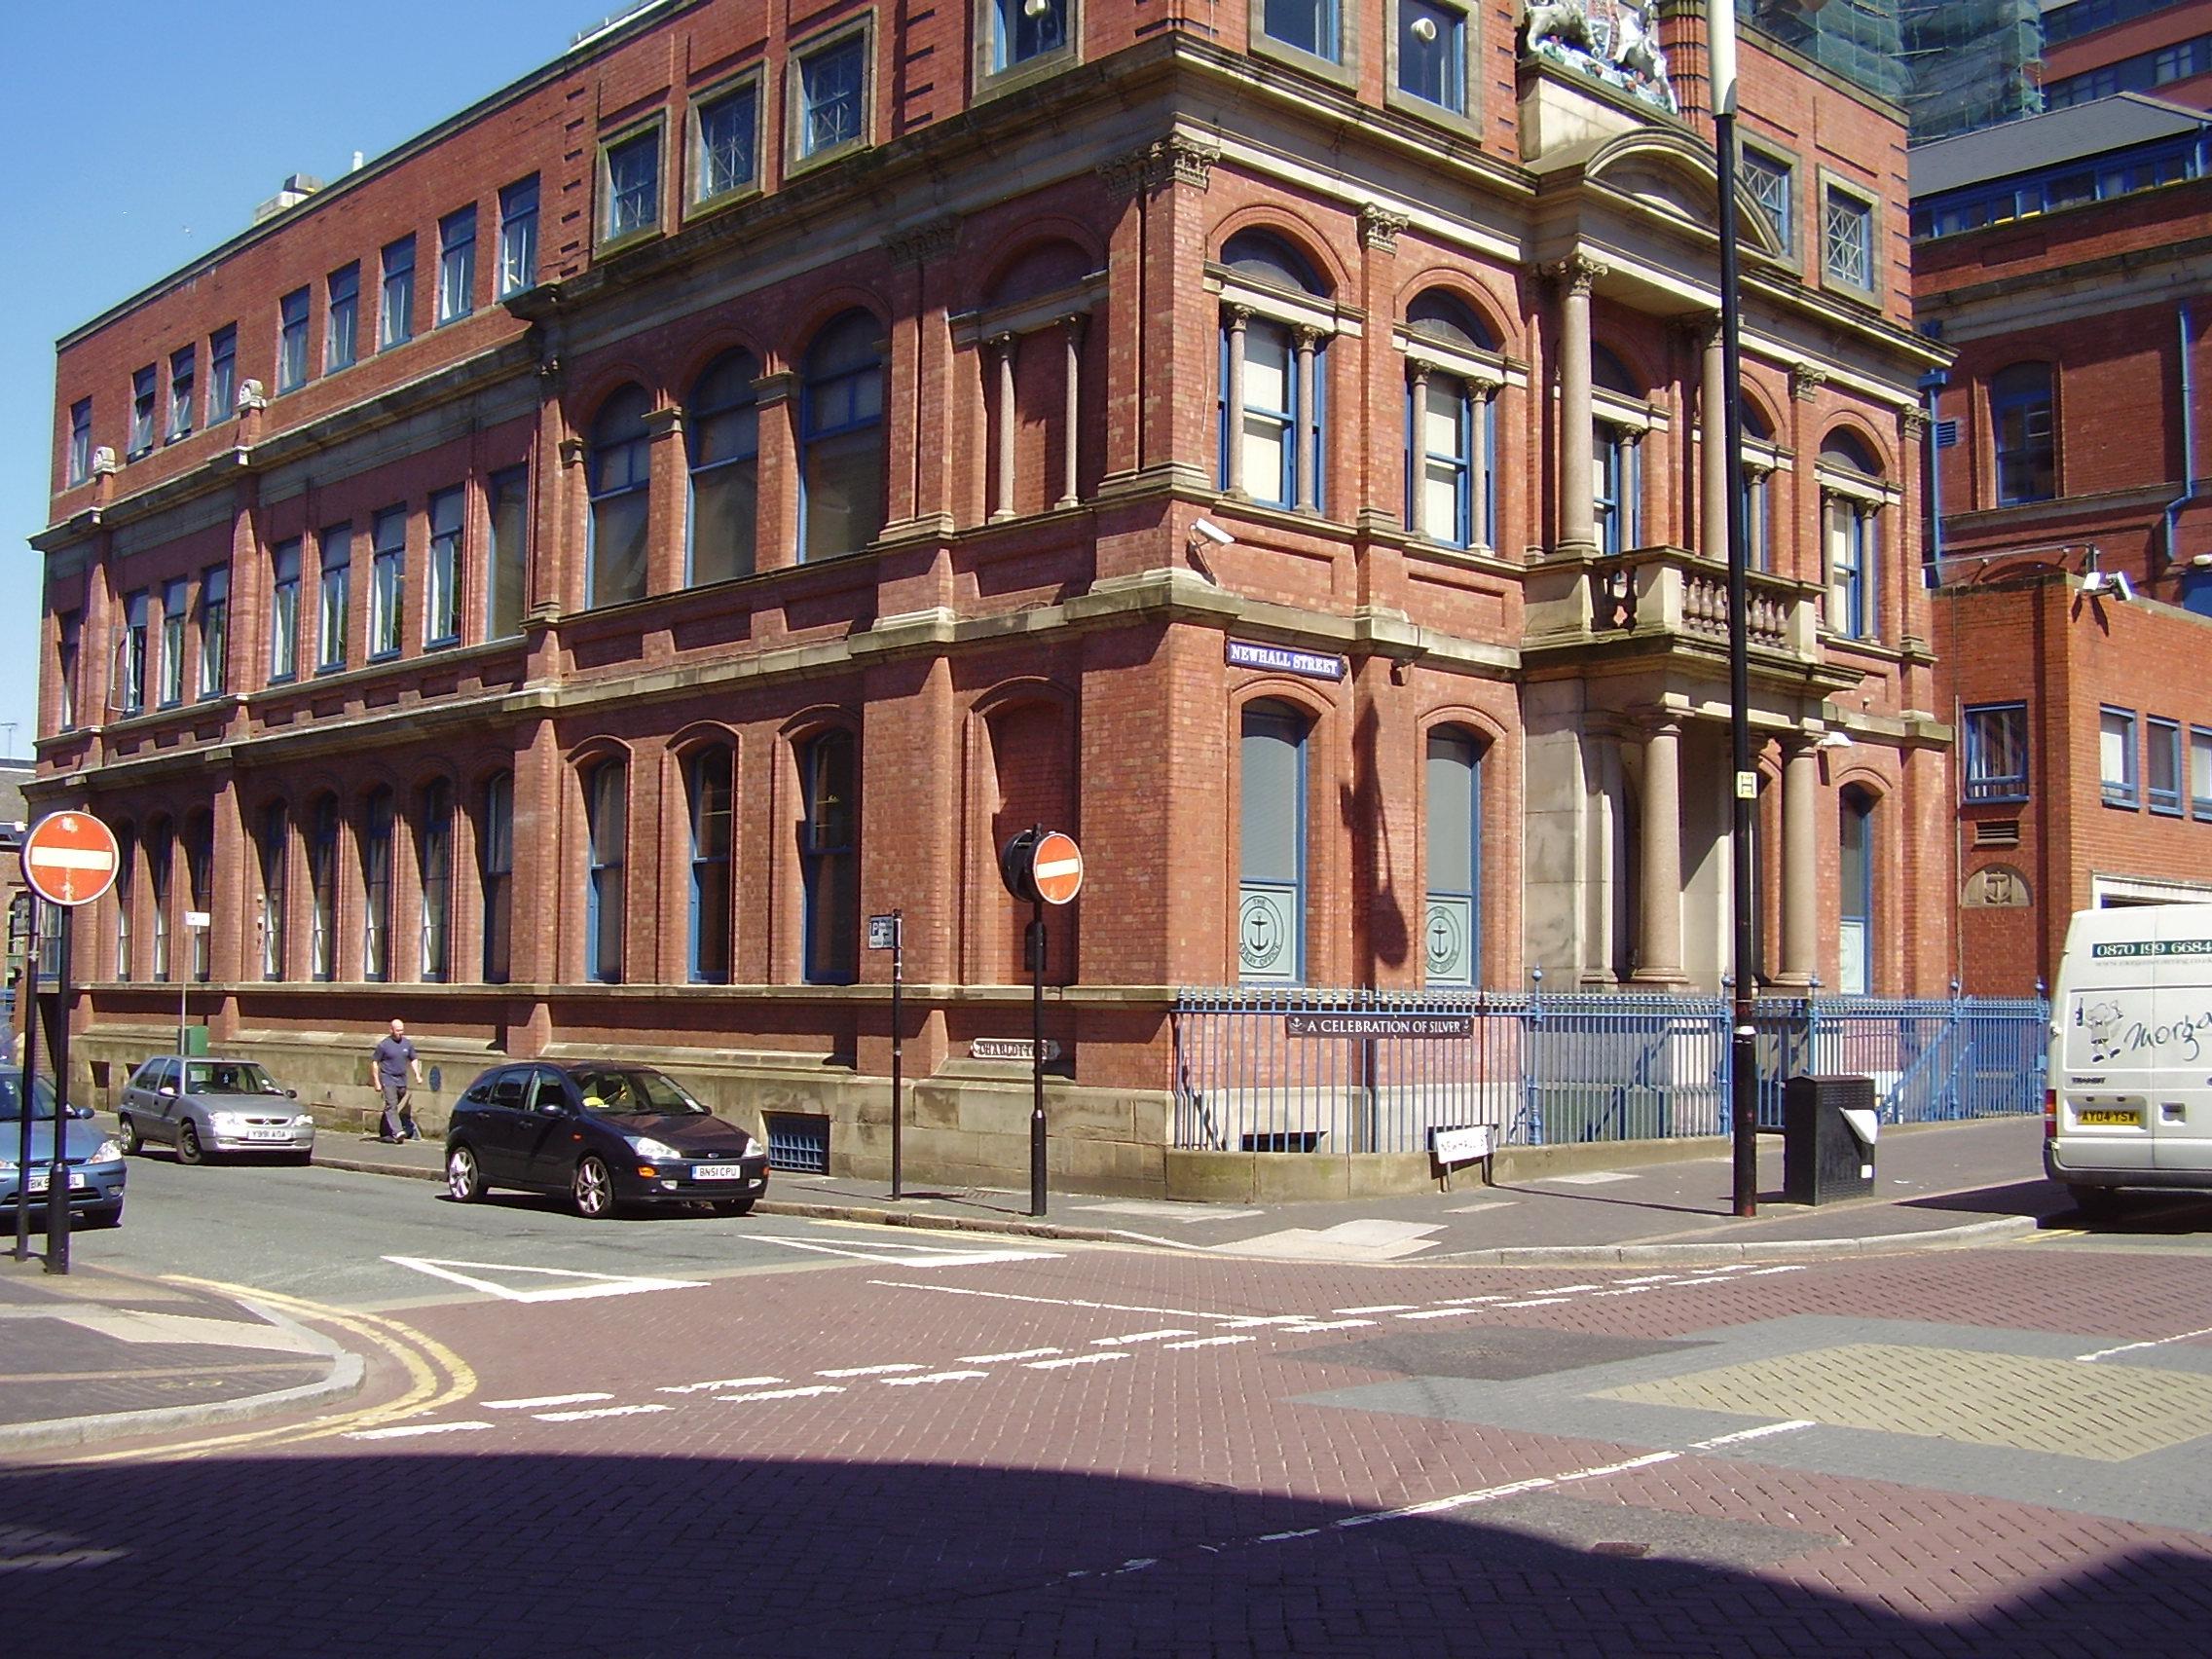 Photo 2008 The Birmingham Assay Office Built 1773 Newhall Street, Jewellery Quarter Birmingham